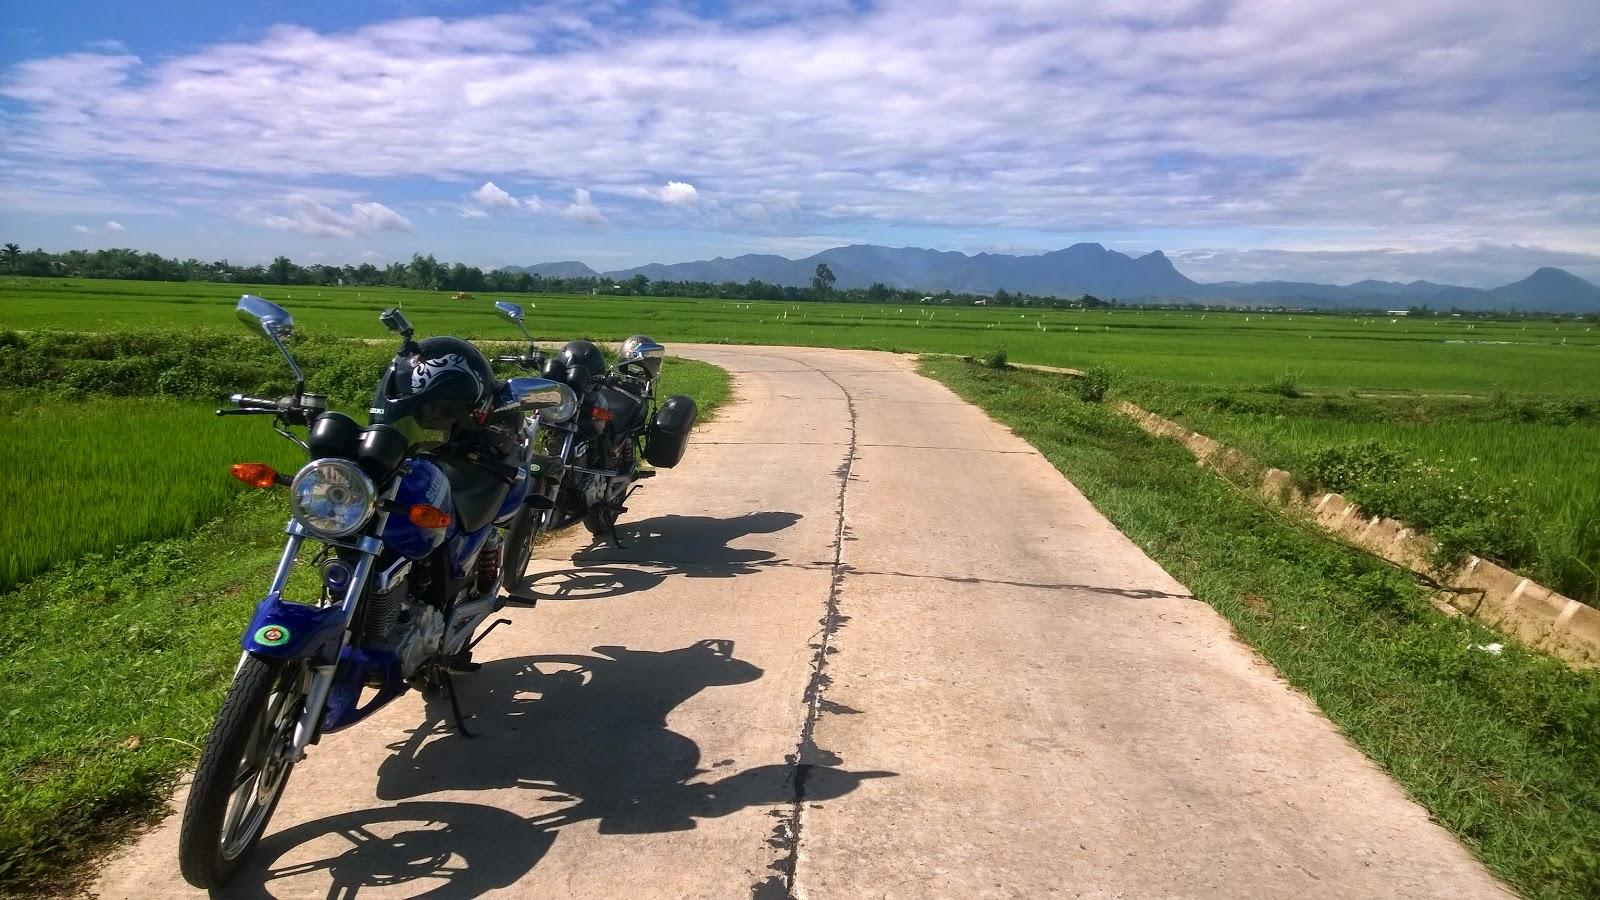 Hoi An - Hue or Hue - Hoi An: ( 1 day - 145km)